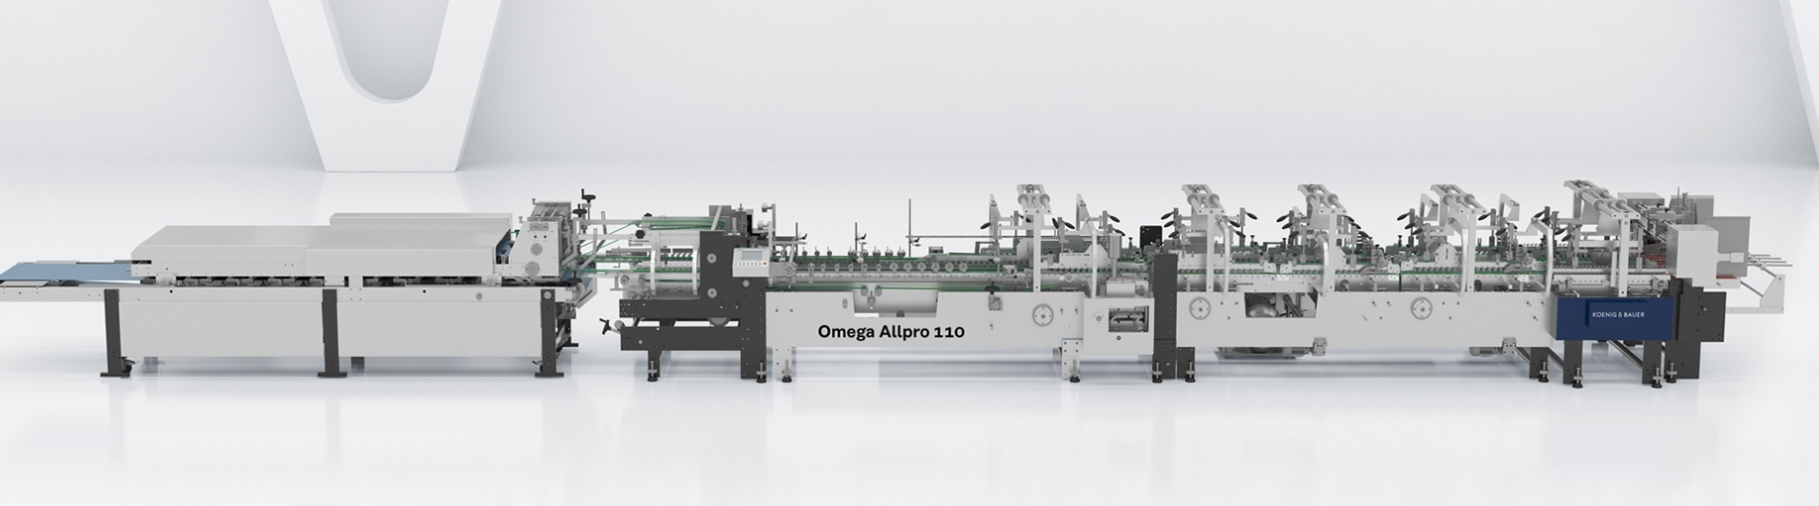 Omega Allpro di Duran - Piegaincolla Koenig & Bauer Duran